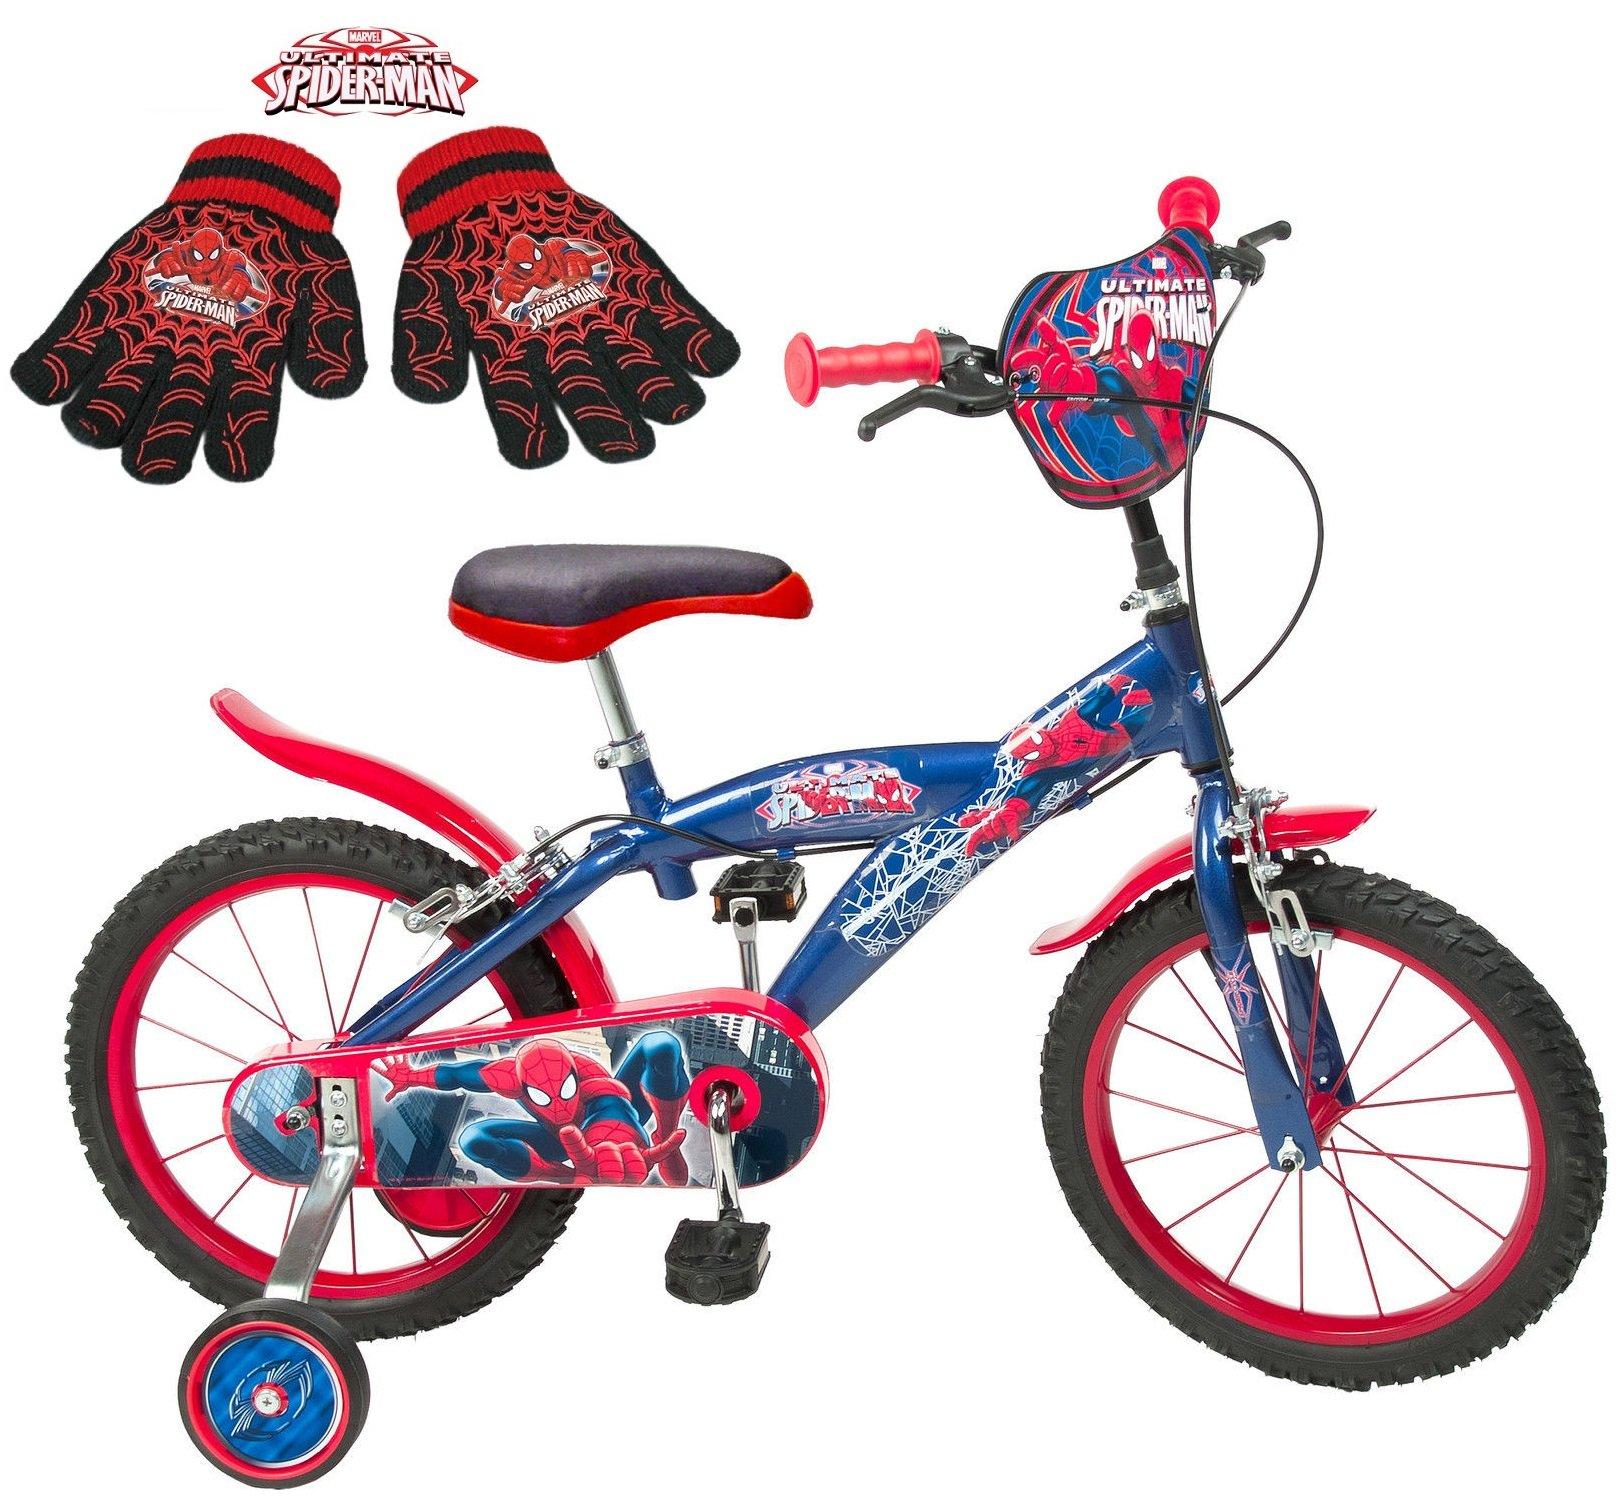 Ultimate Spider-Man bicicleta infantil 12 14 40.64 cm rojo azul ...